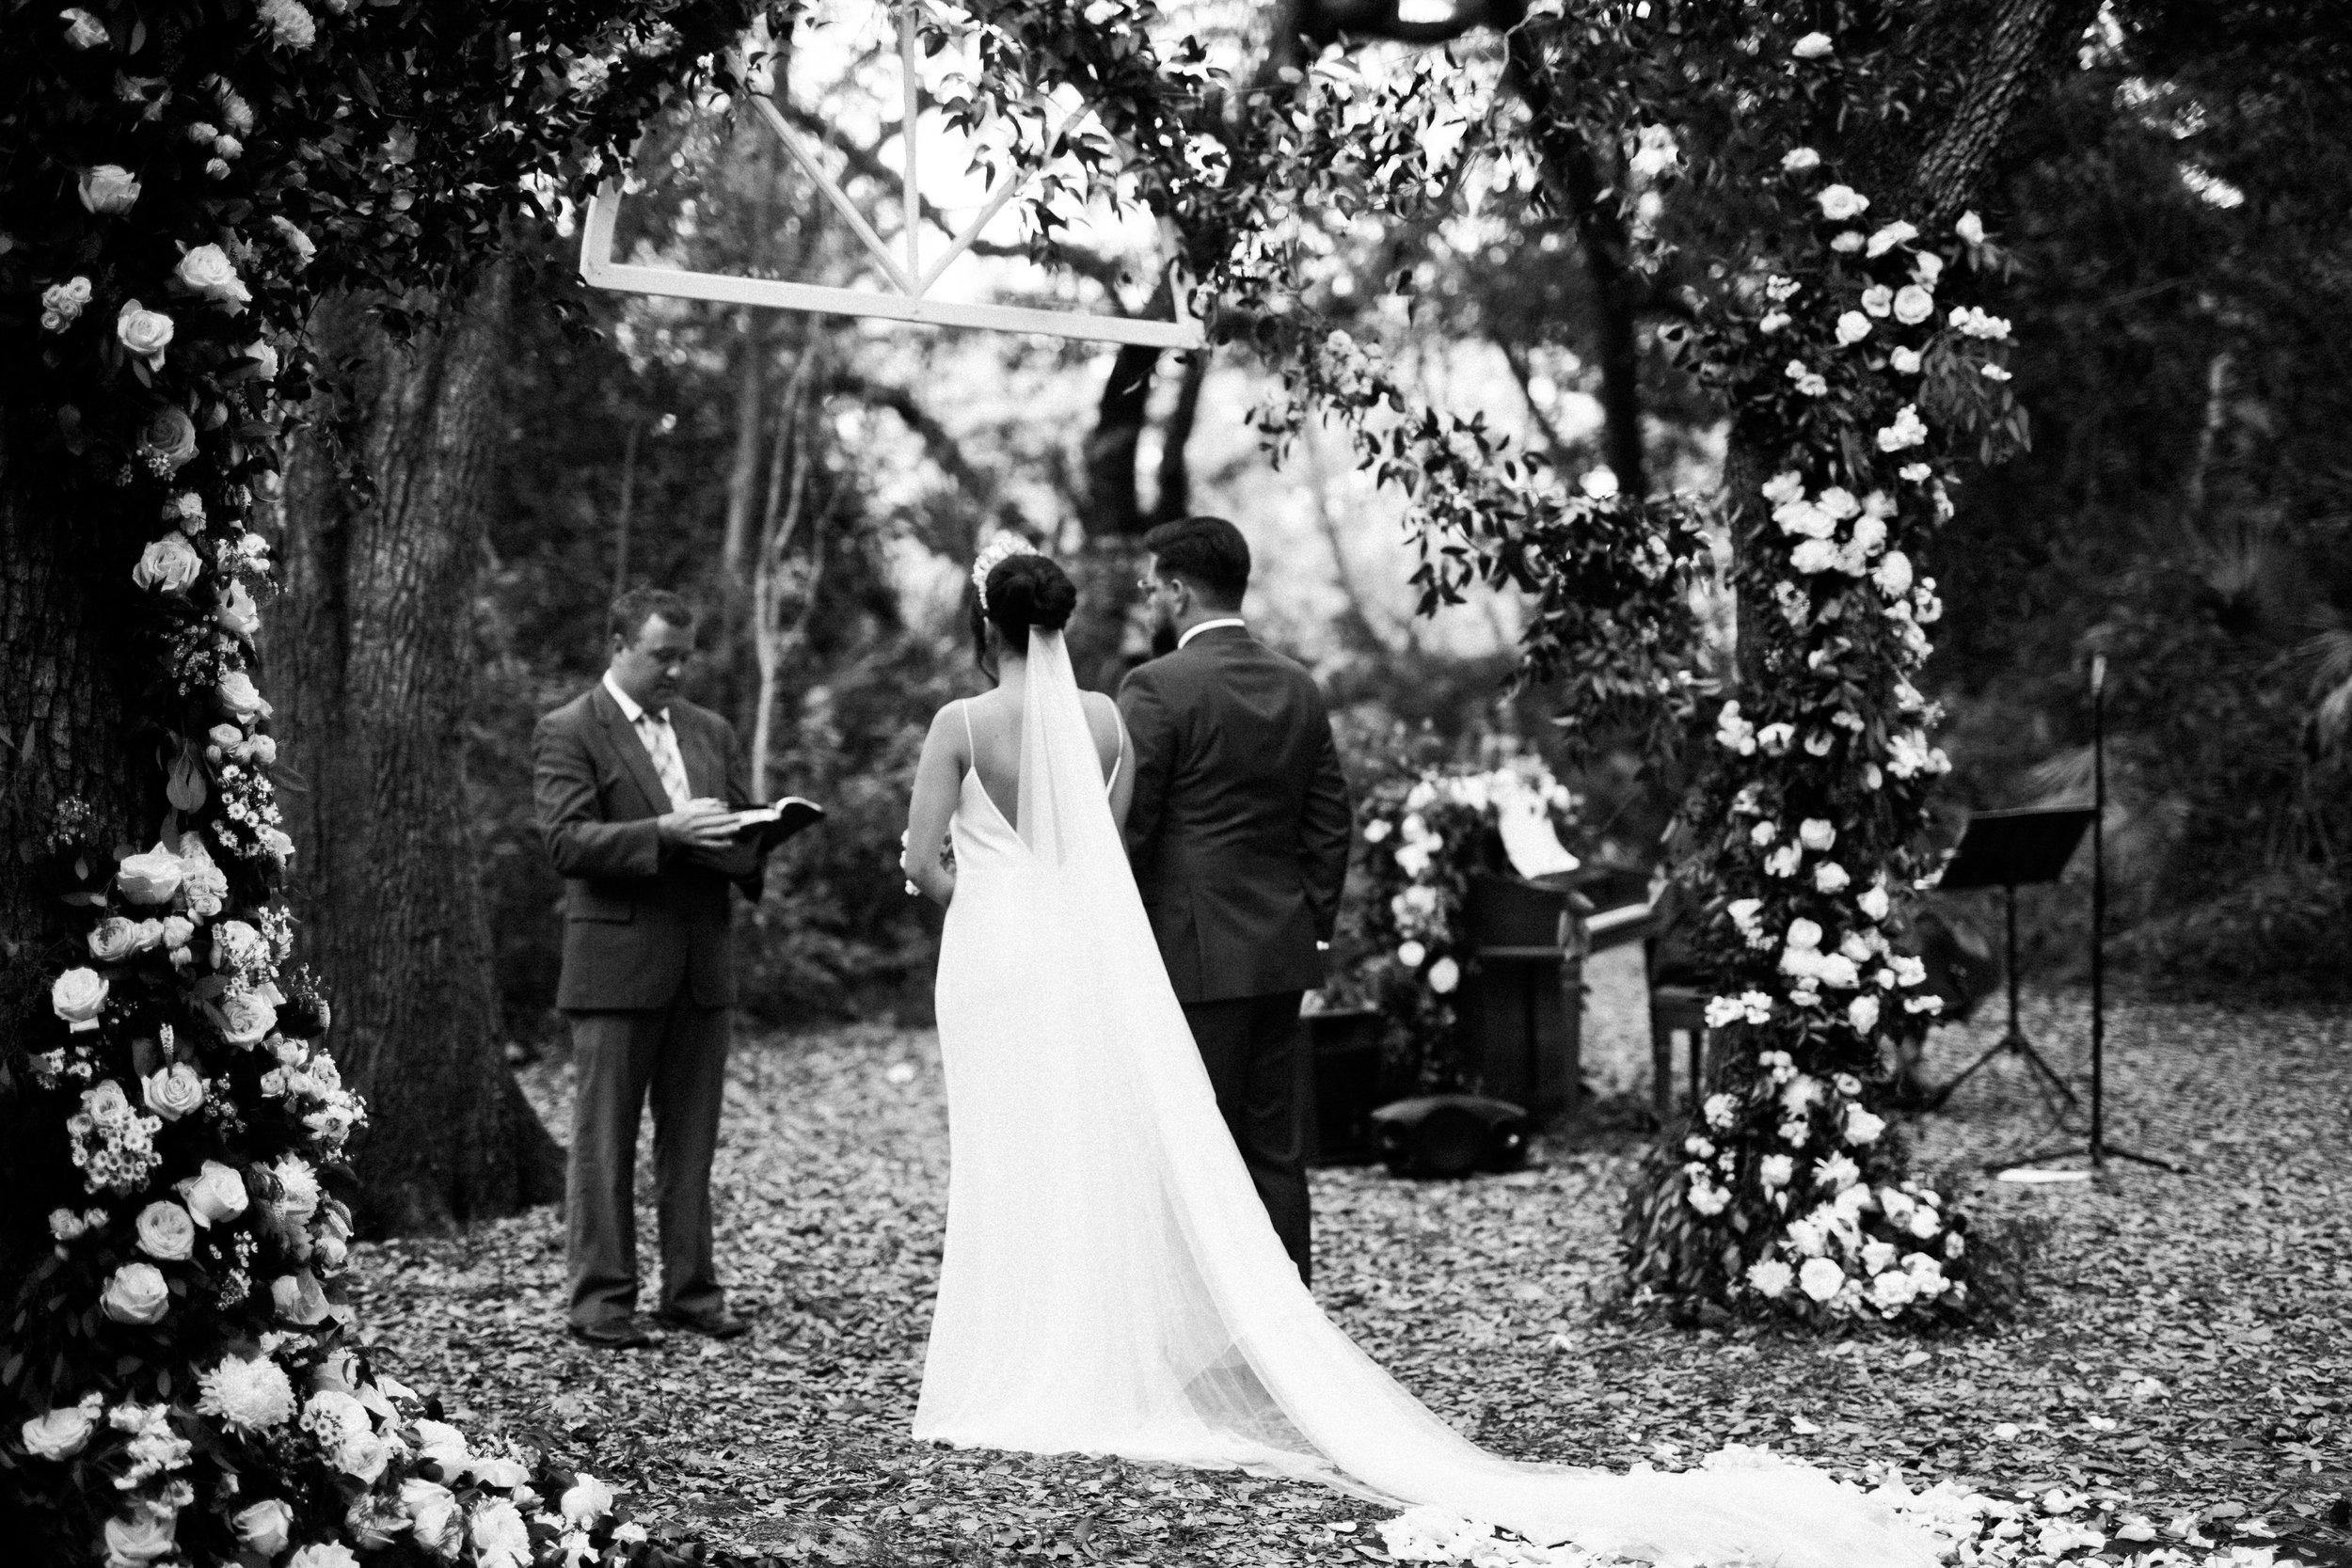 32-greynolds-park-wedding-ceremony.jpg